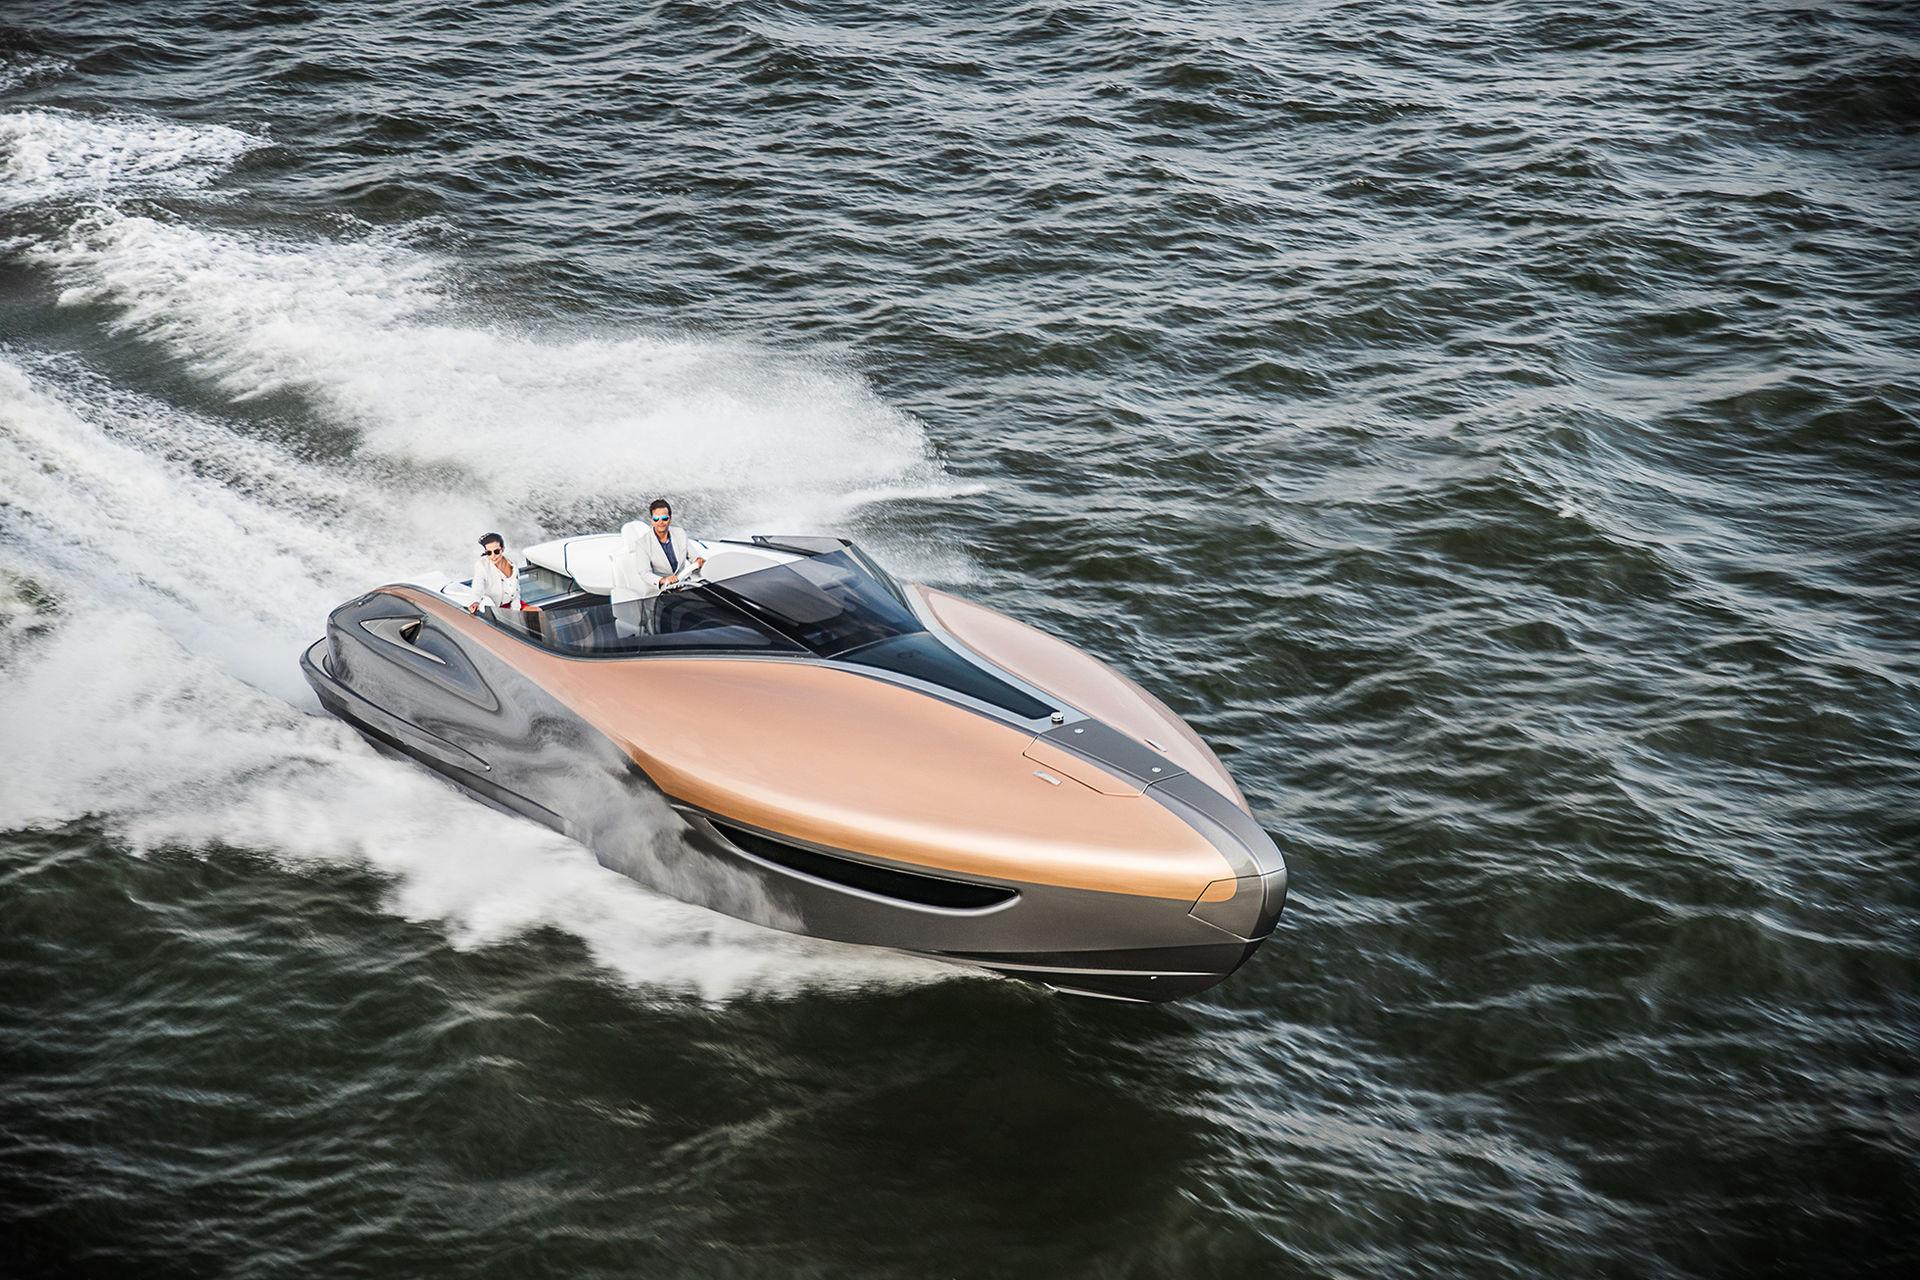 Lexus visar båtkoncept